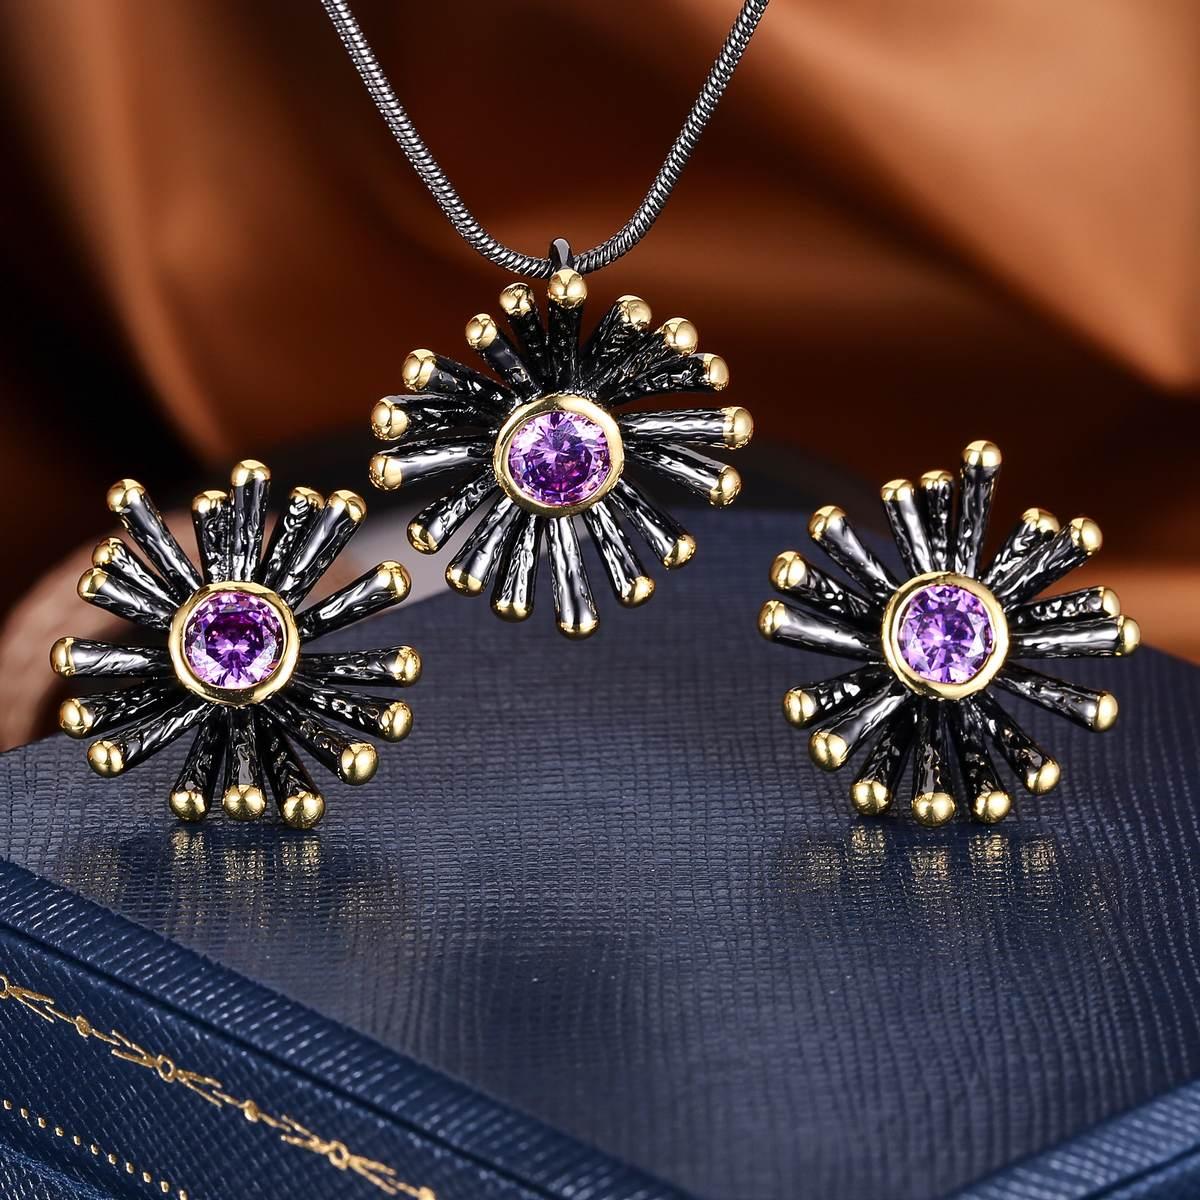 ZHE FAN 2018 New Jewelry Sets For Women Round Cut AAA Cubic Zirconia Black Gold Color 2 Tone Plating Pendants Stud Earring Sets rowin 1 5 lcd tuner metronome tone generator black 2 x aaa